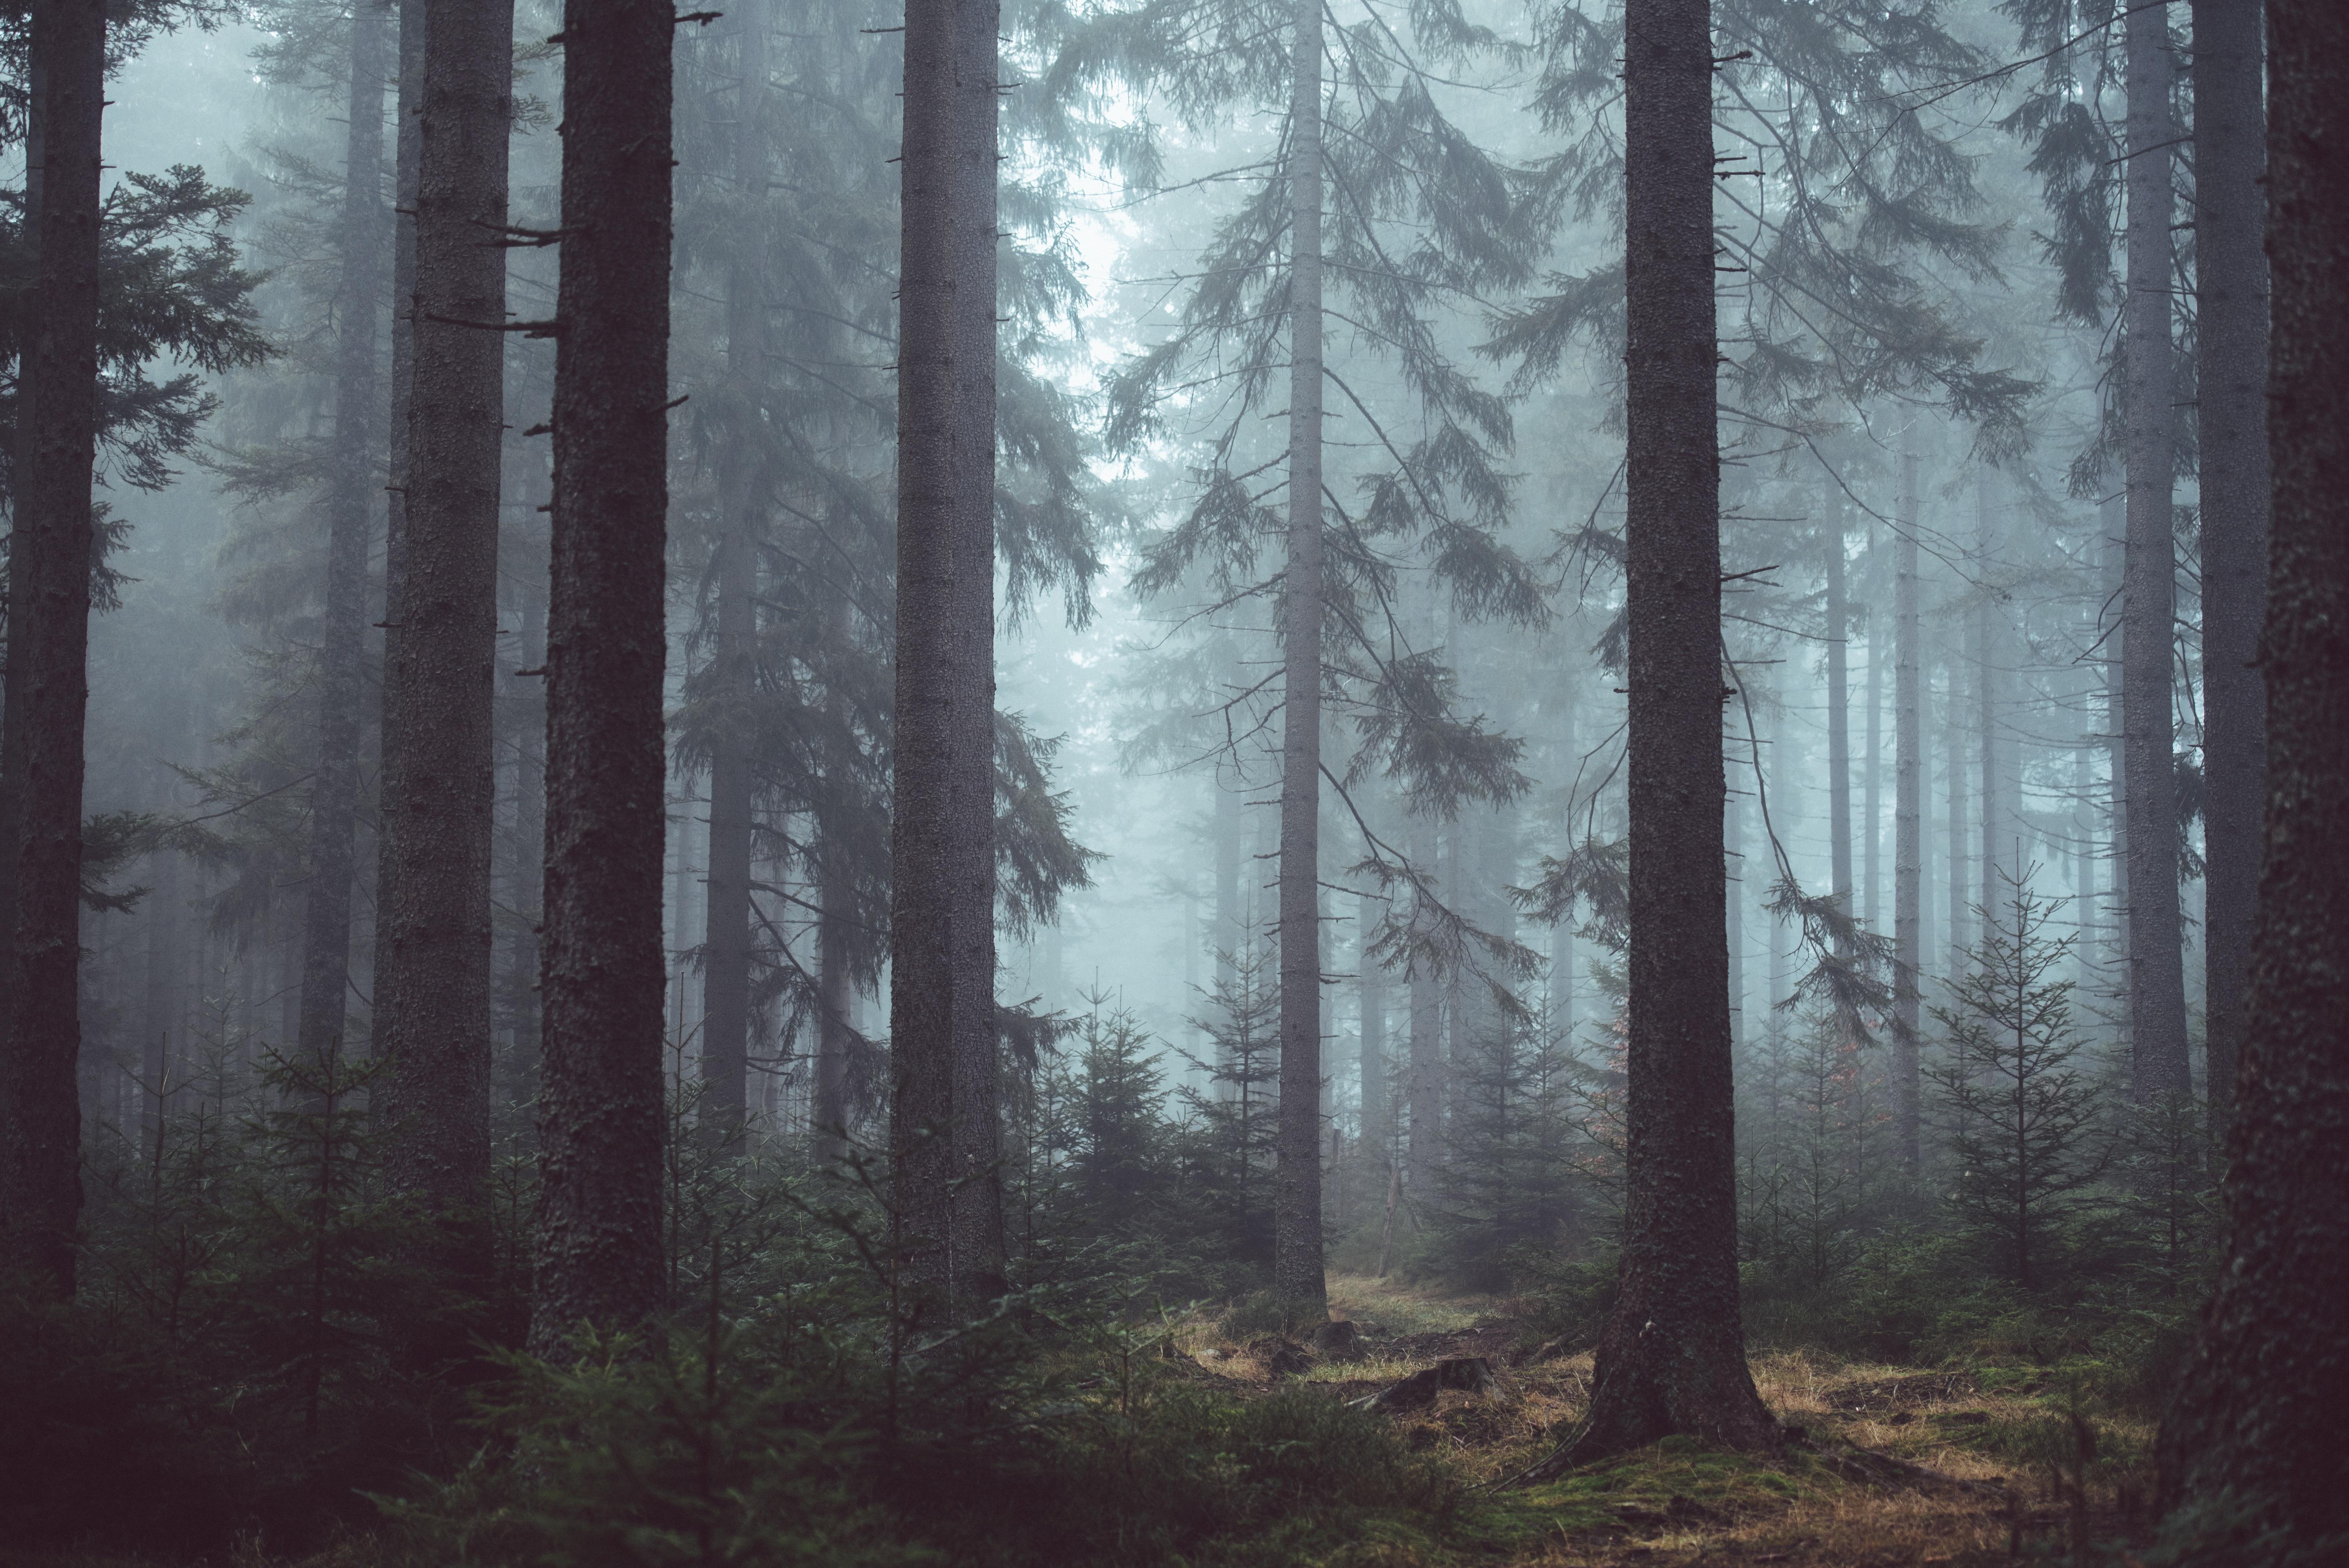 Jungle, Tree, Wood, Plants, Forest, HQ Photo